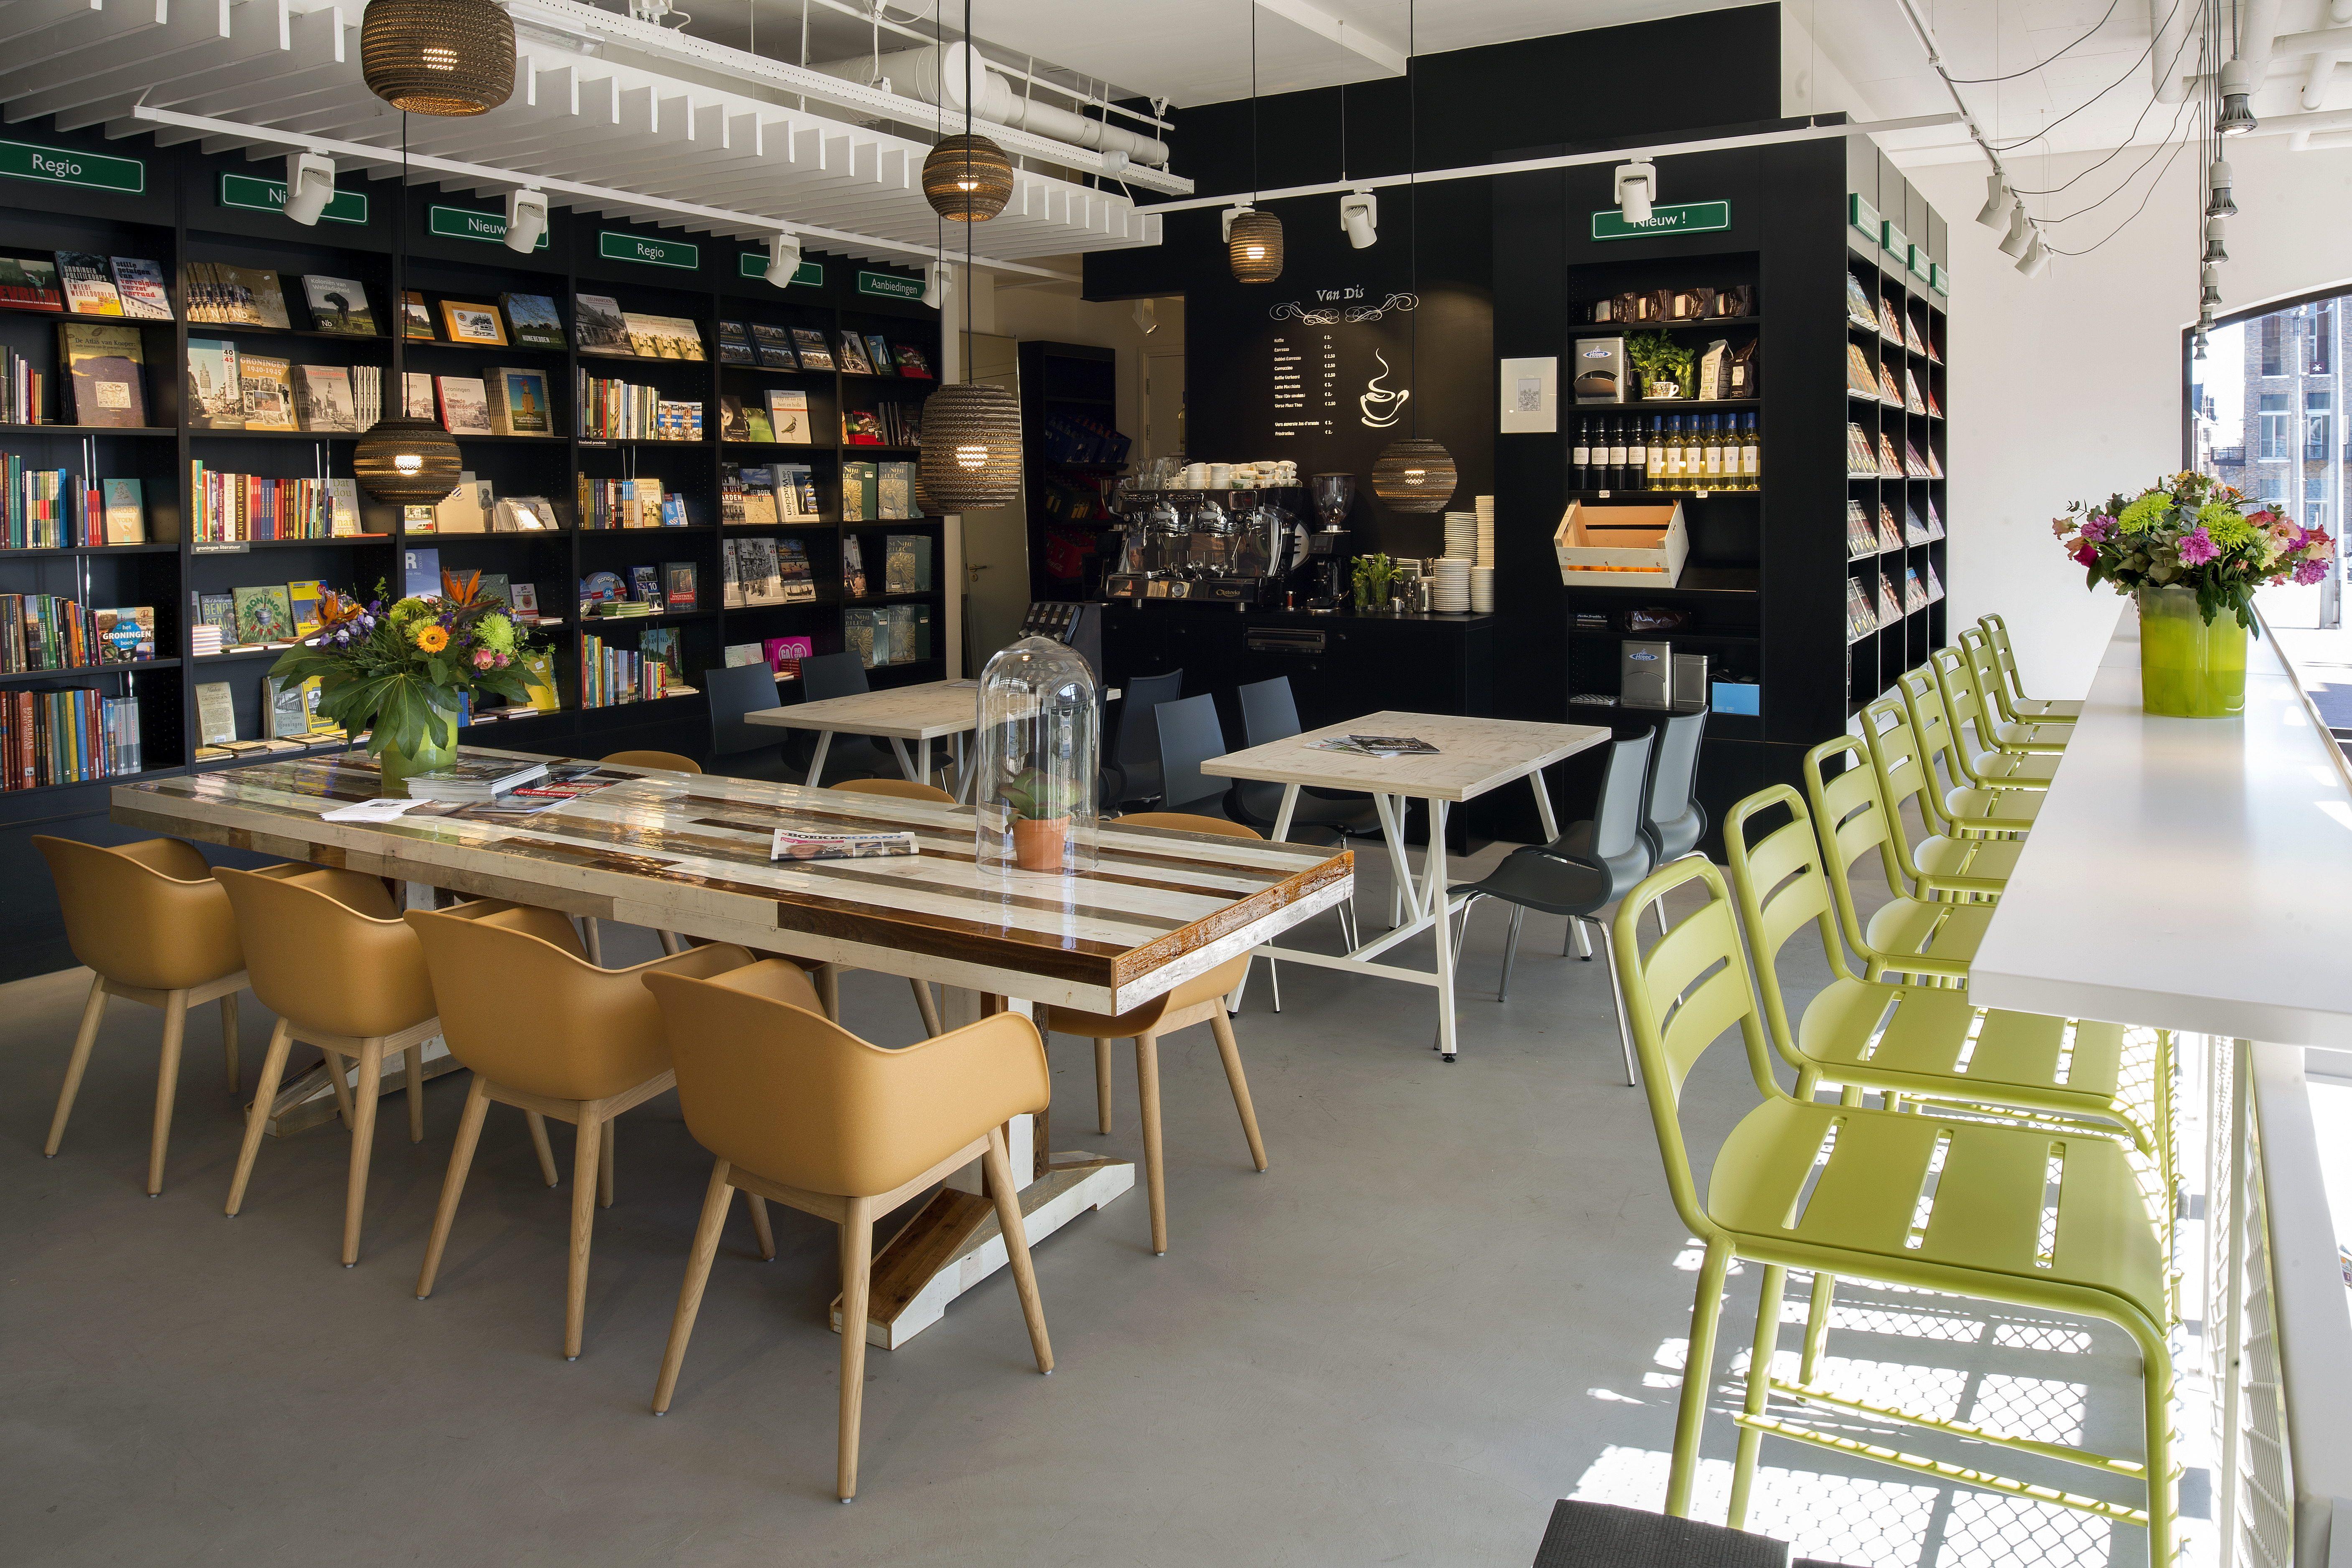 Bookstore Design Retail Design Shop Design Store Design Bookshop Interior Bookstore Design Store Design Interior Bookstore Cafe